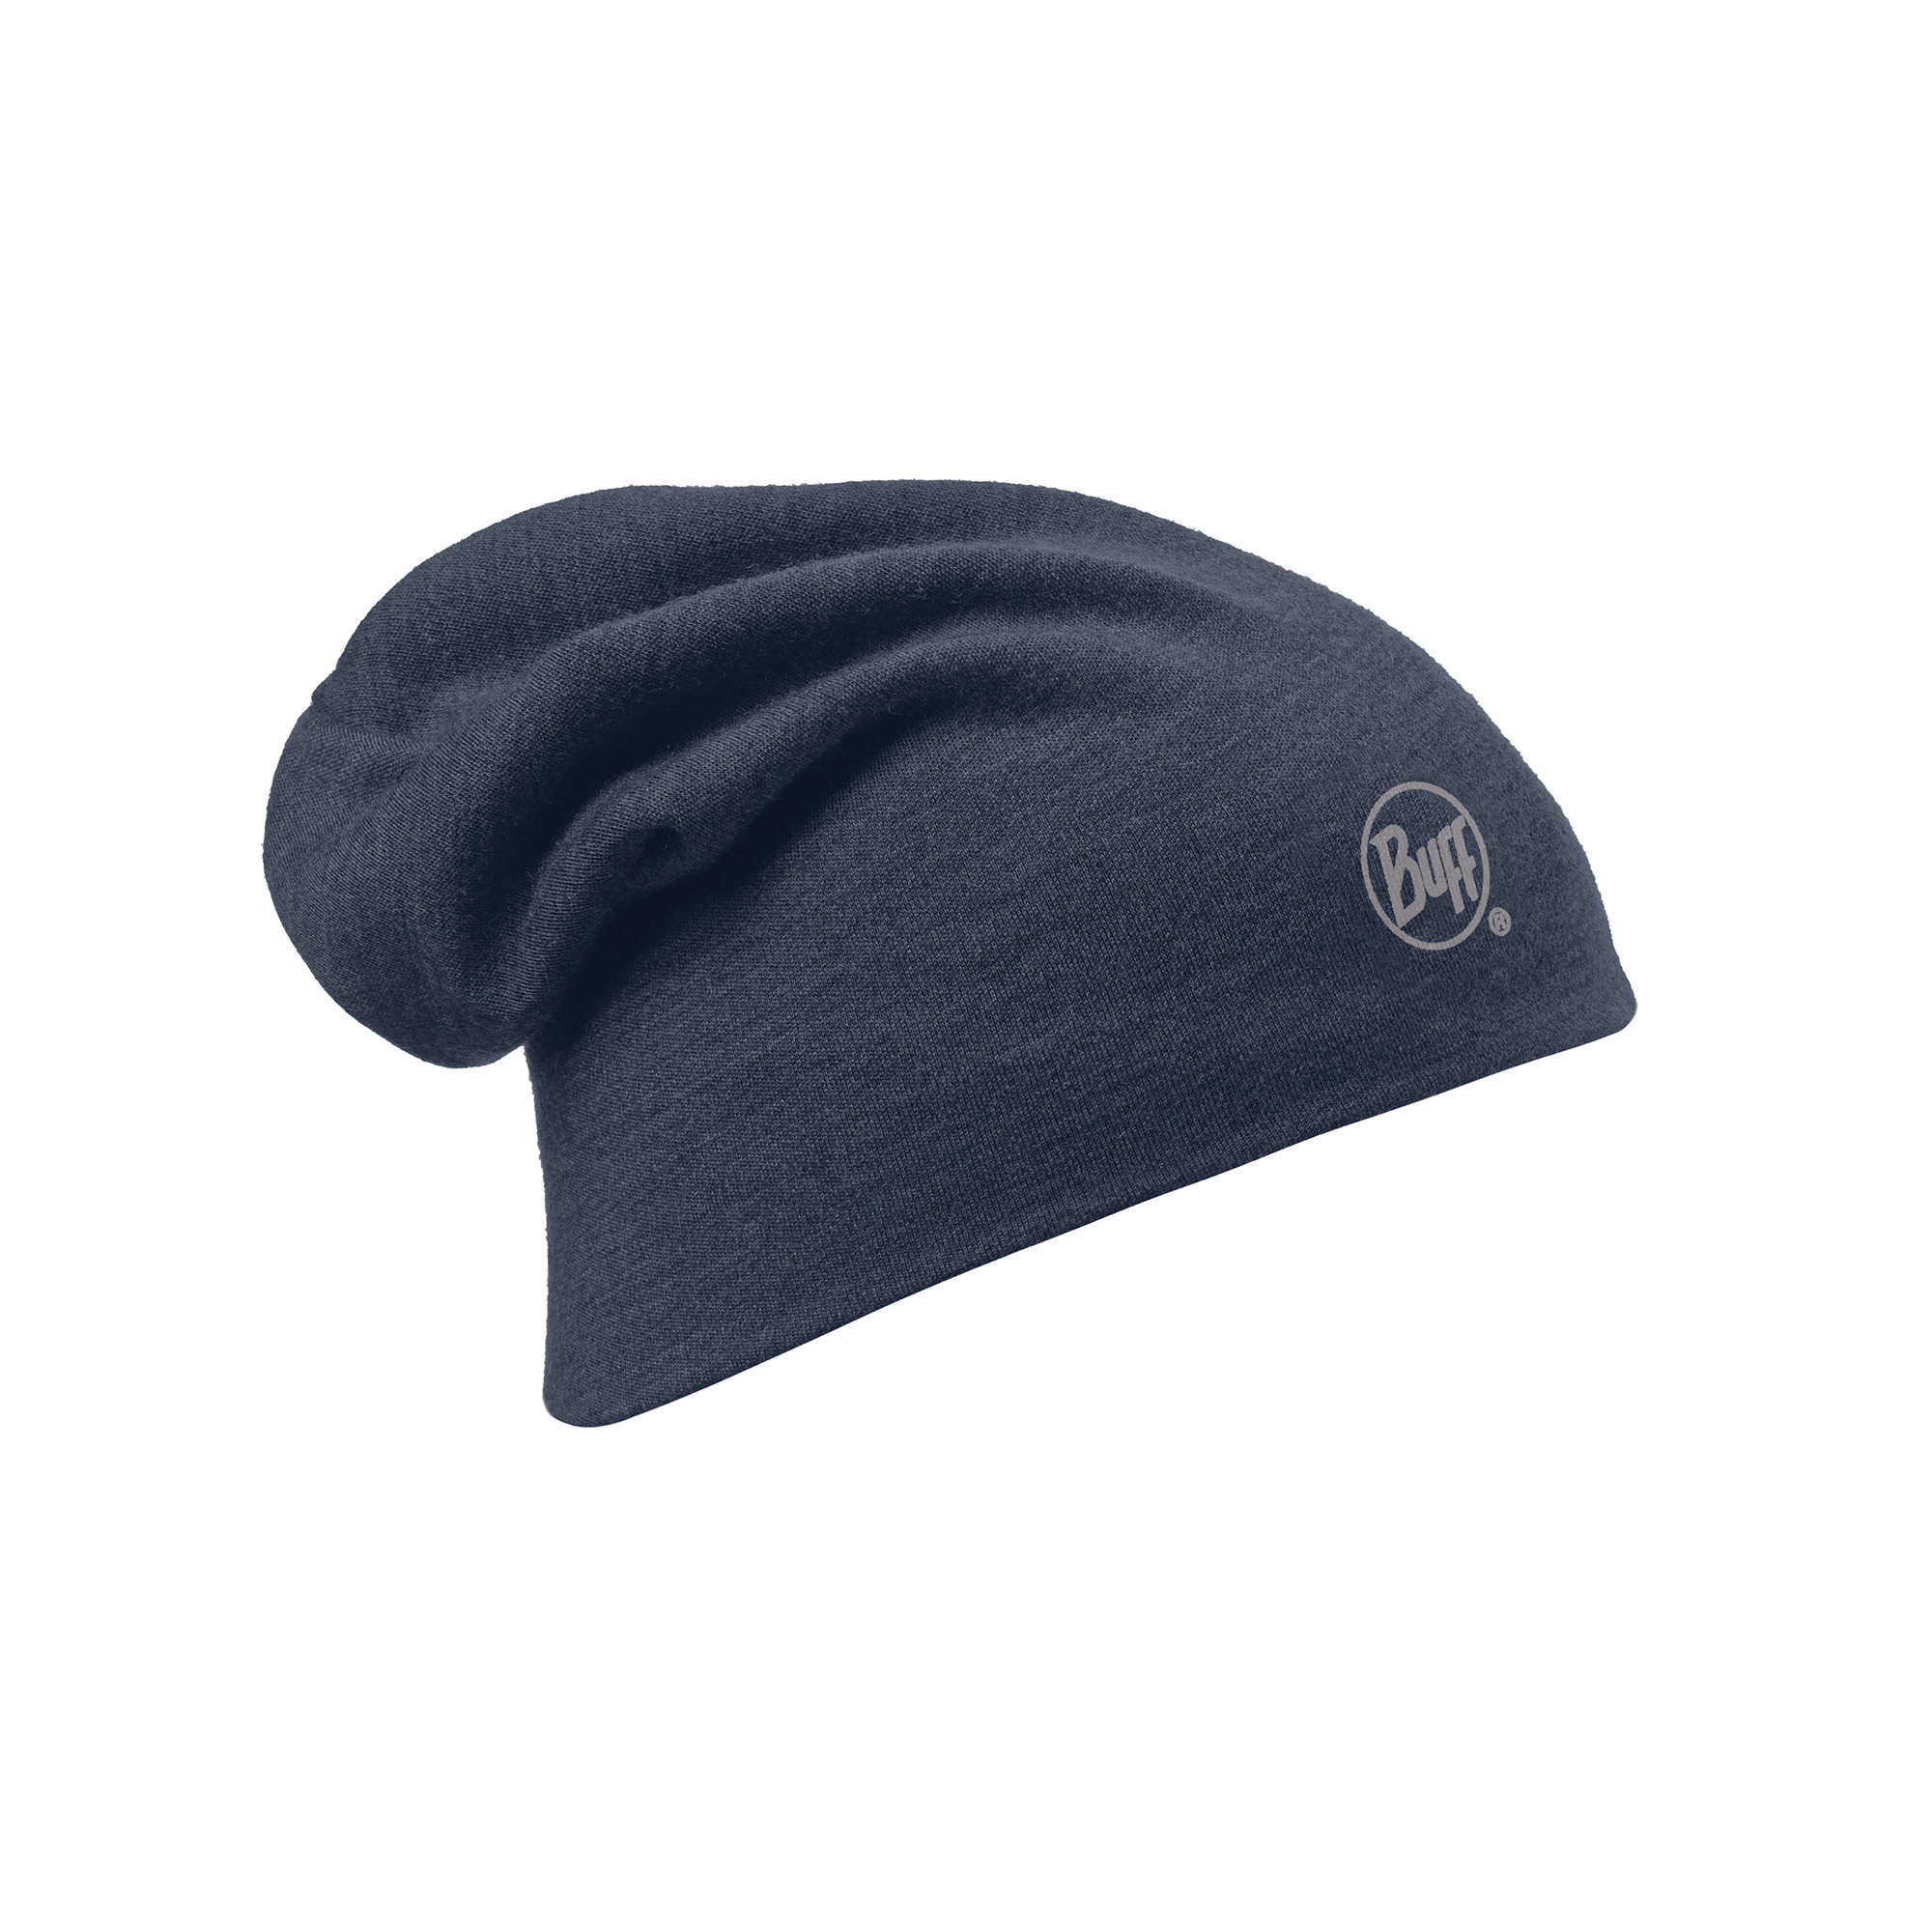 15f8cc7fef9 NeroQom Shop – BUFF Merino Wool Thermal Hat 5pc